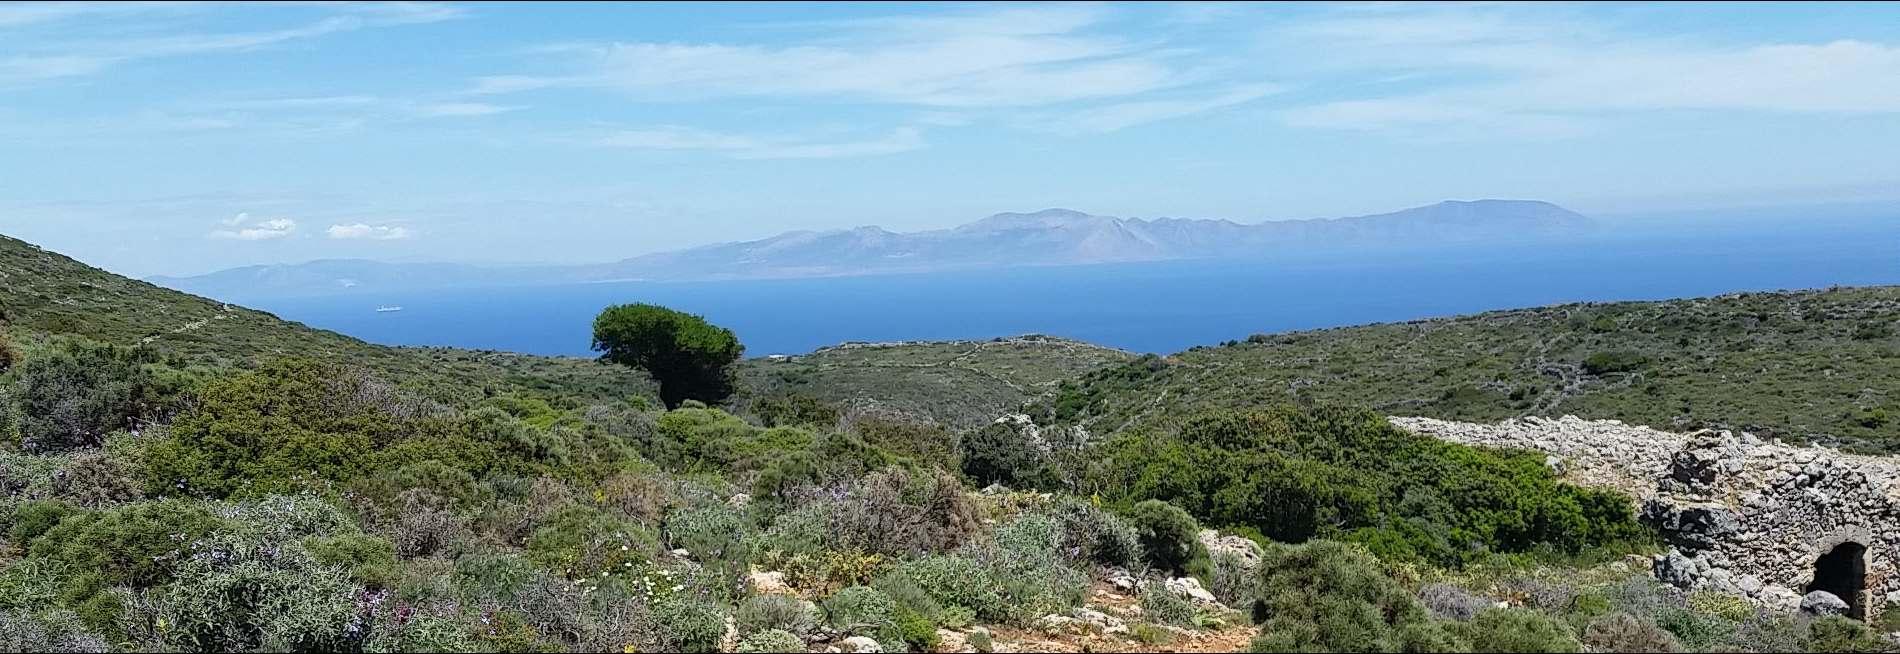 Wanderblog - Insel Kythira